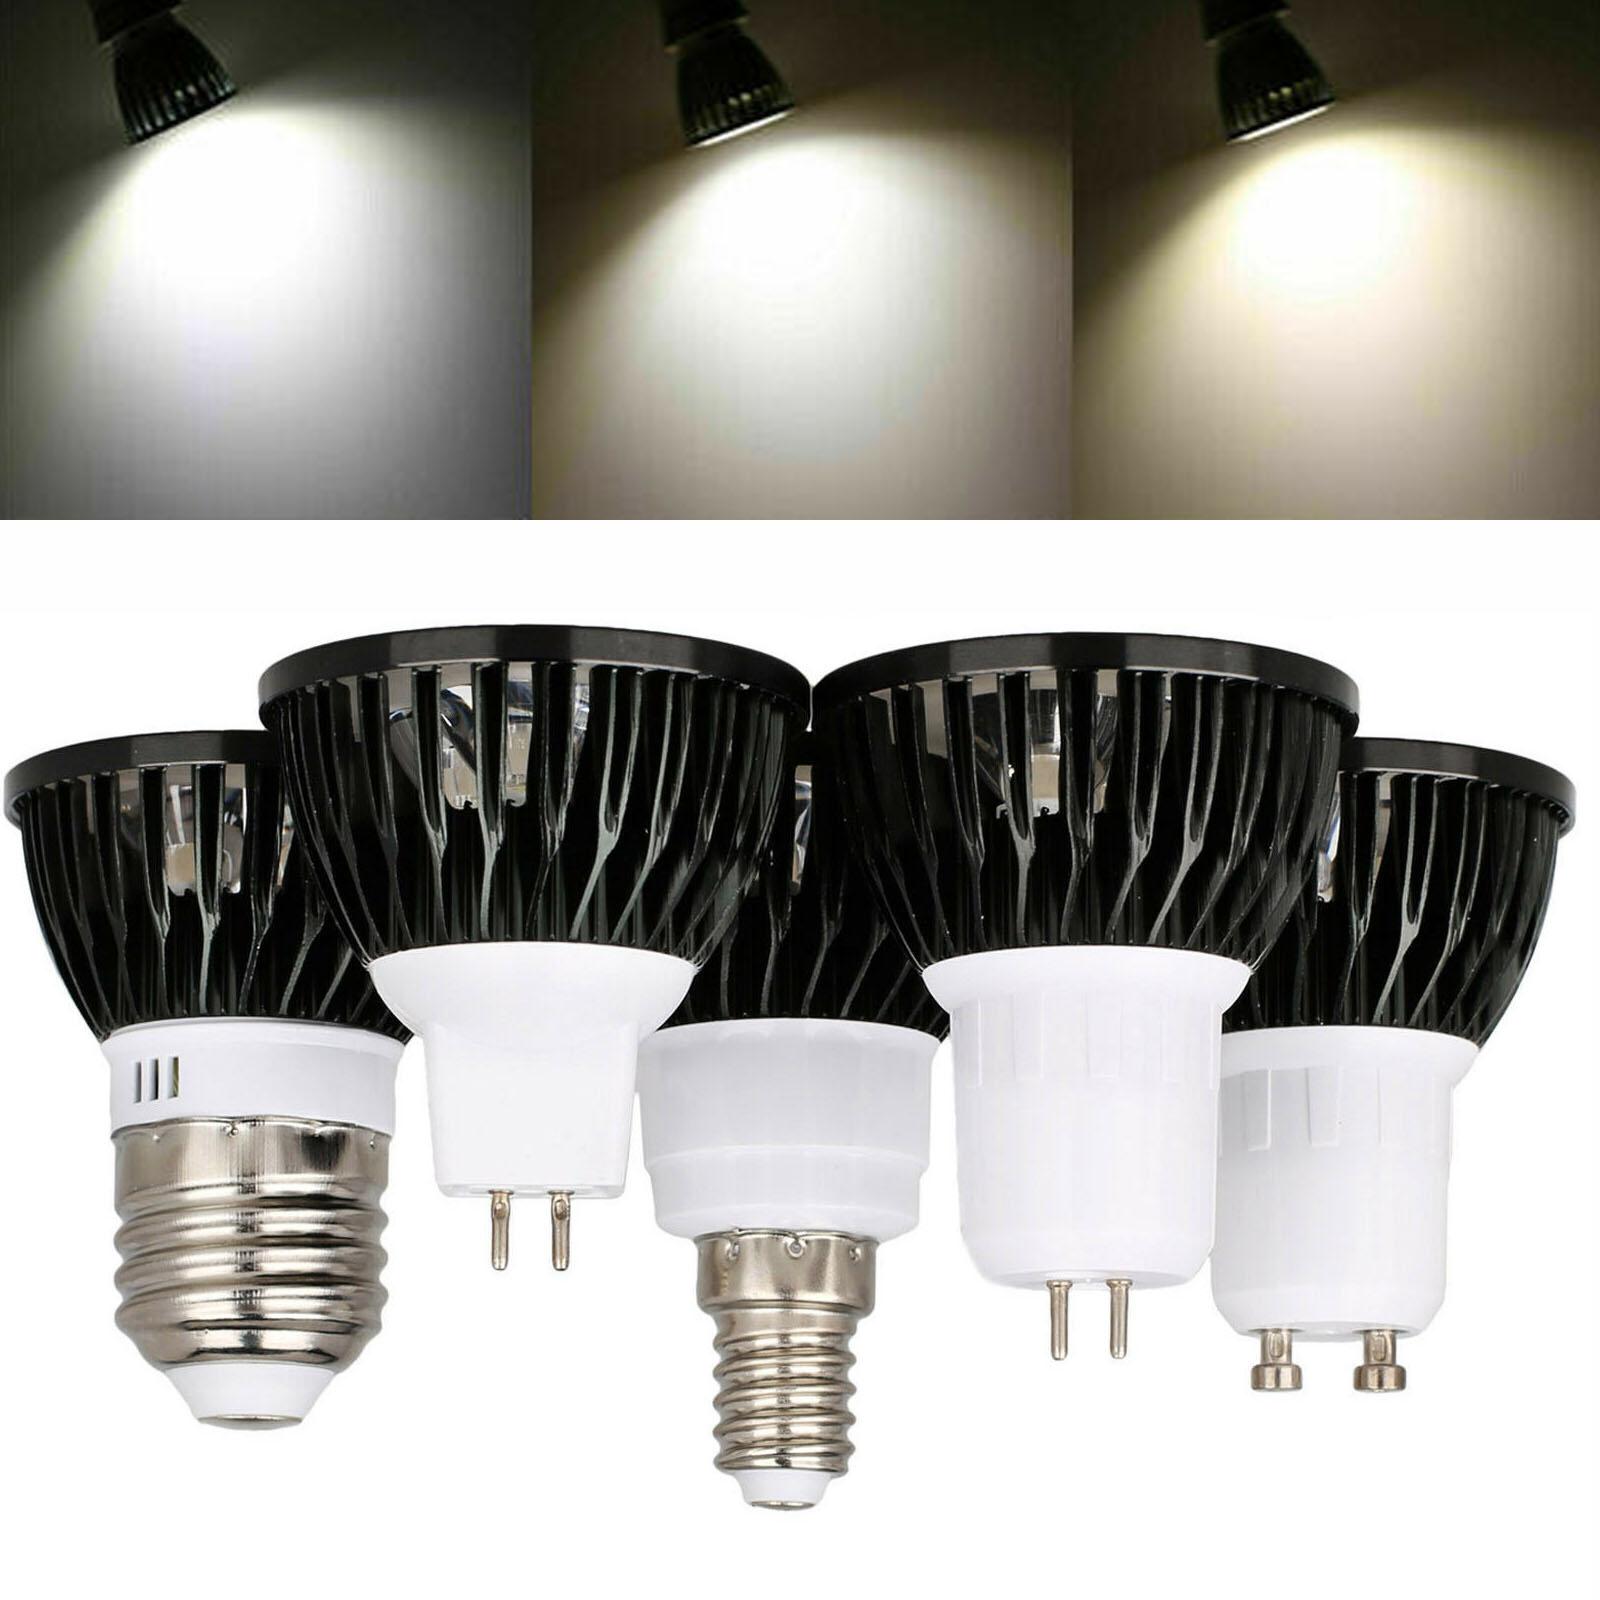 GU10 MR16 GU5.3 LED Spotlight 85-265V 12V Cold Warm Neutral White Lamps 45 Degree 12W 15W High Power Replace Halogen Lighting